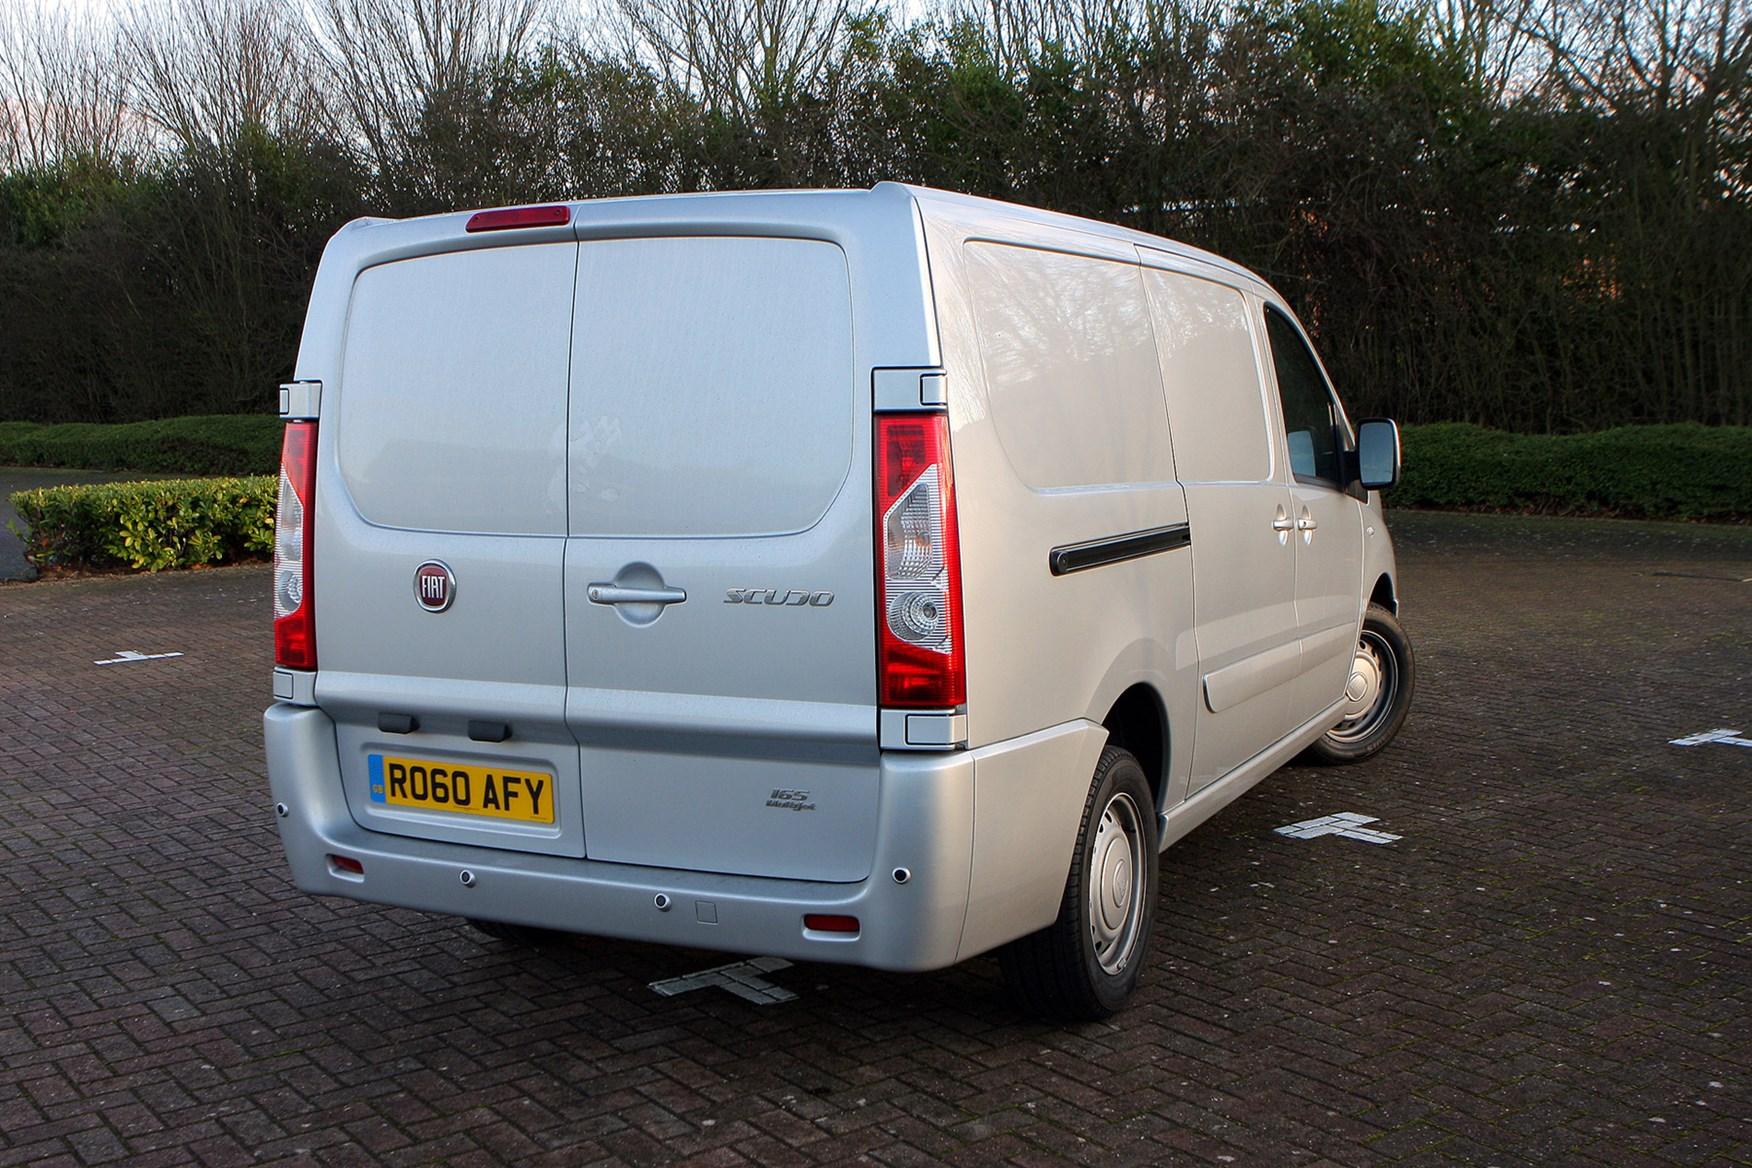 Fiat Scudo 2007-2016 review on Parkers Vans - rear